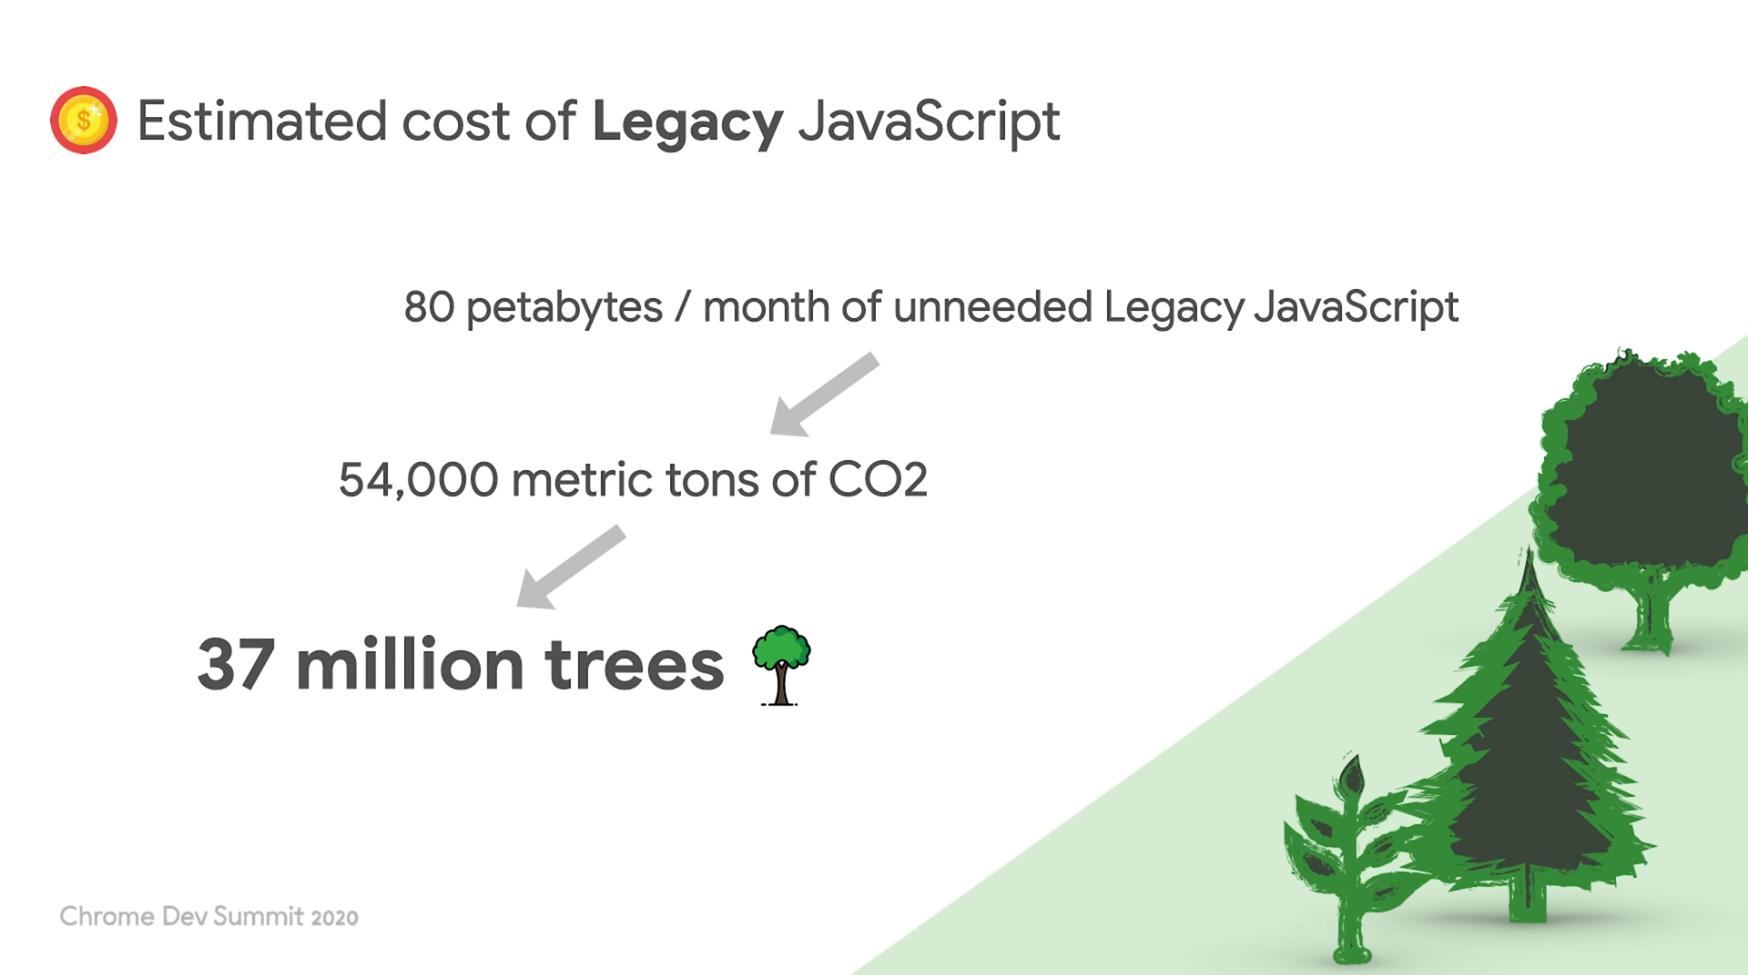 Estimated cost of legacy javascript